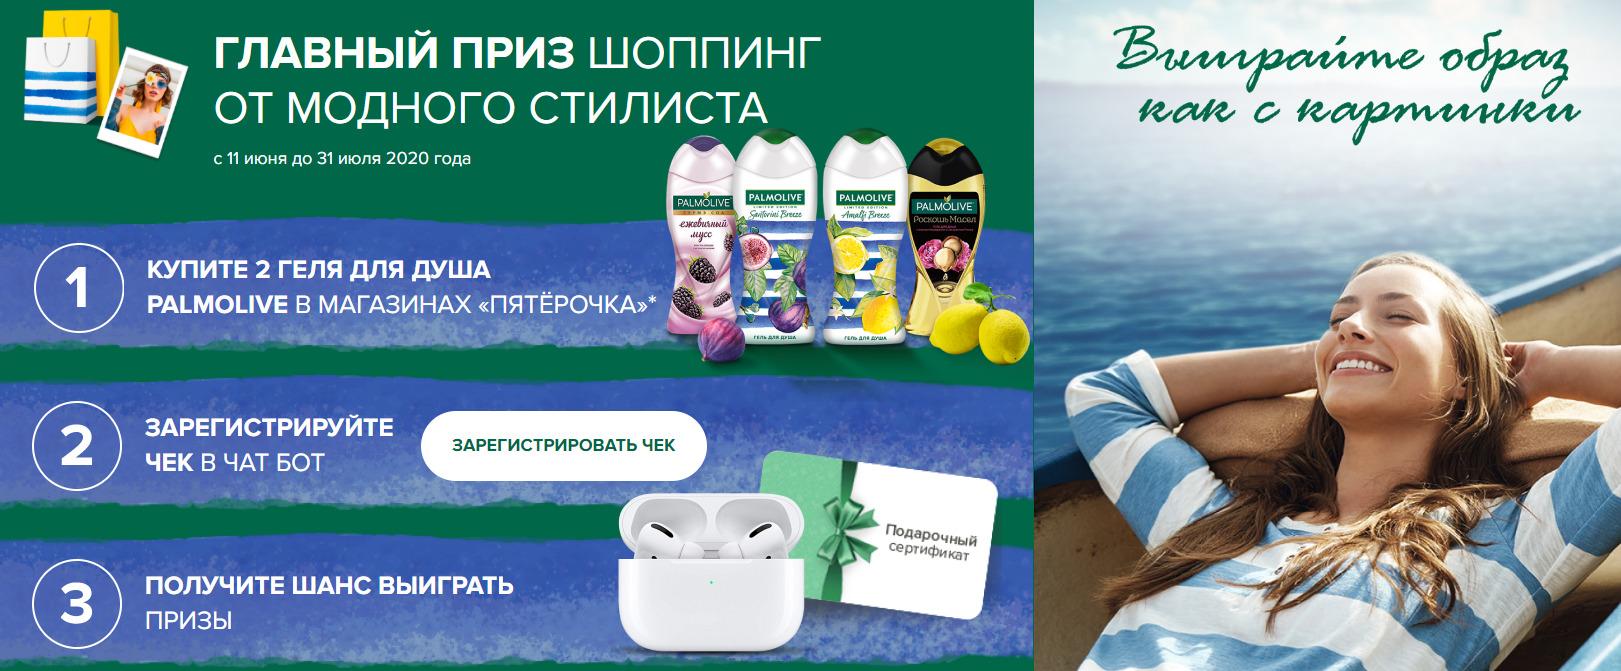 Акция от Палмолив с 11 июня по 31 июля 2020